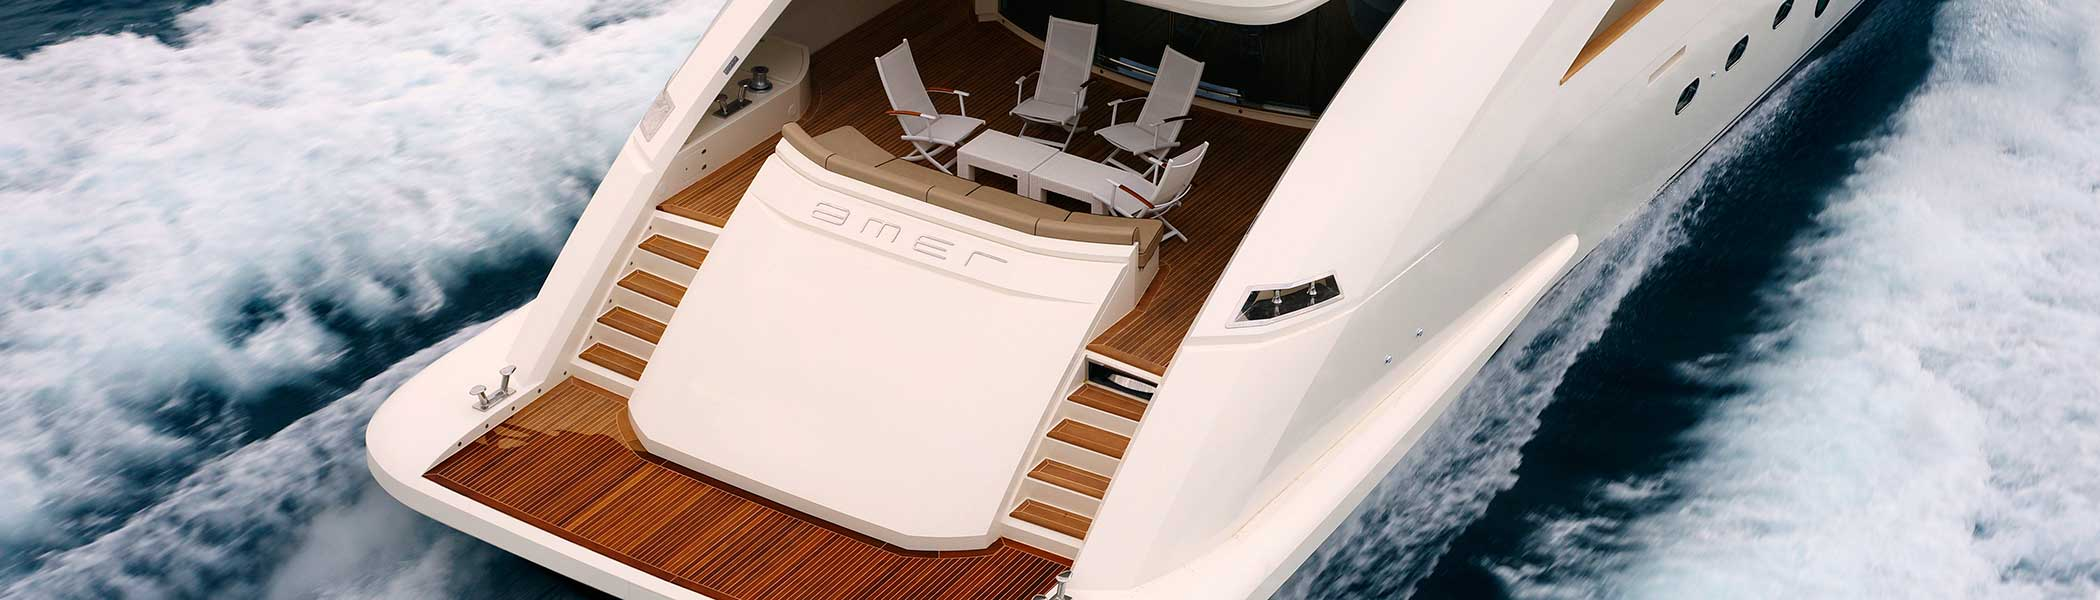 Amer Yachts - Amer 116 a116-3